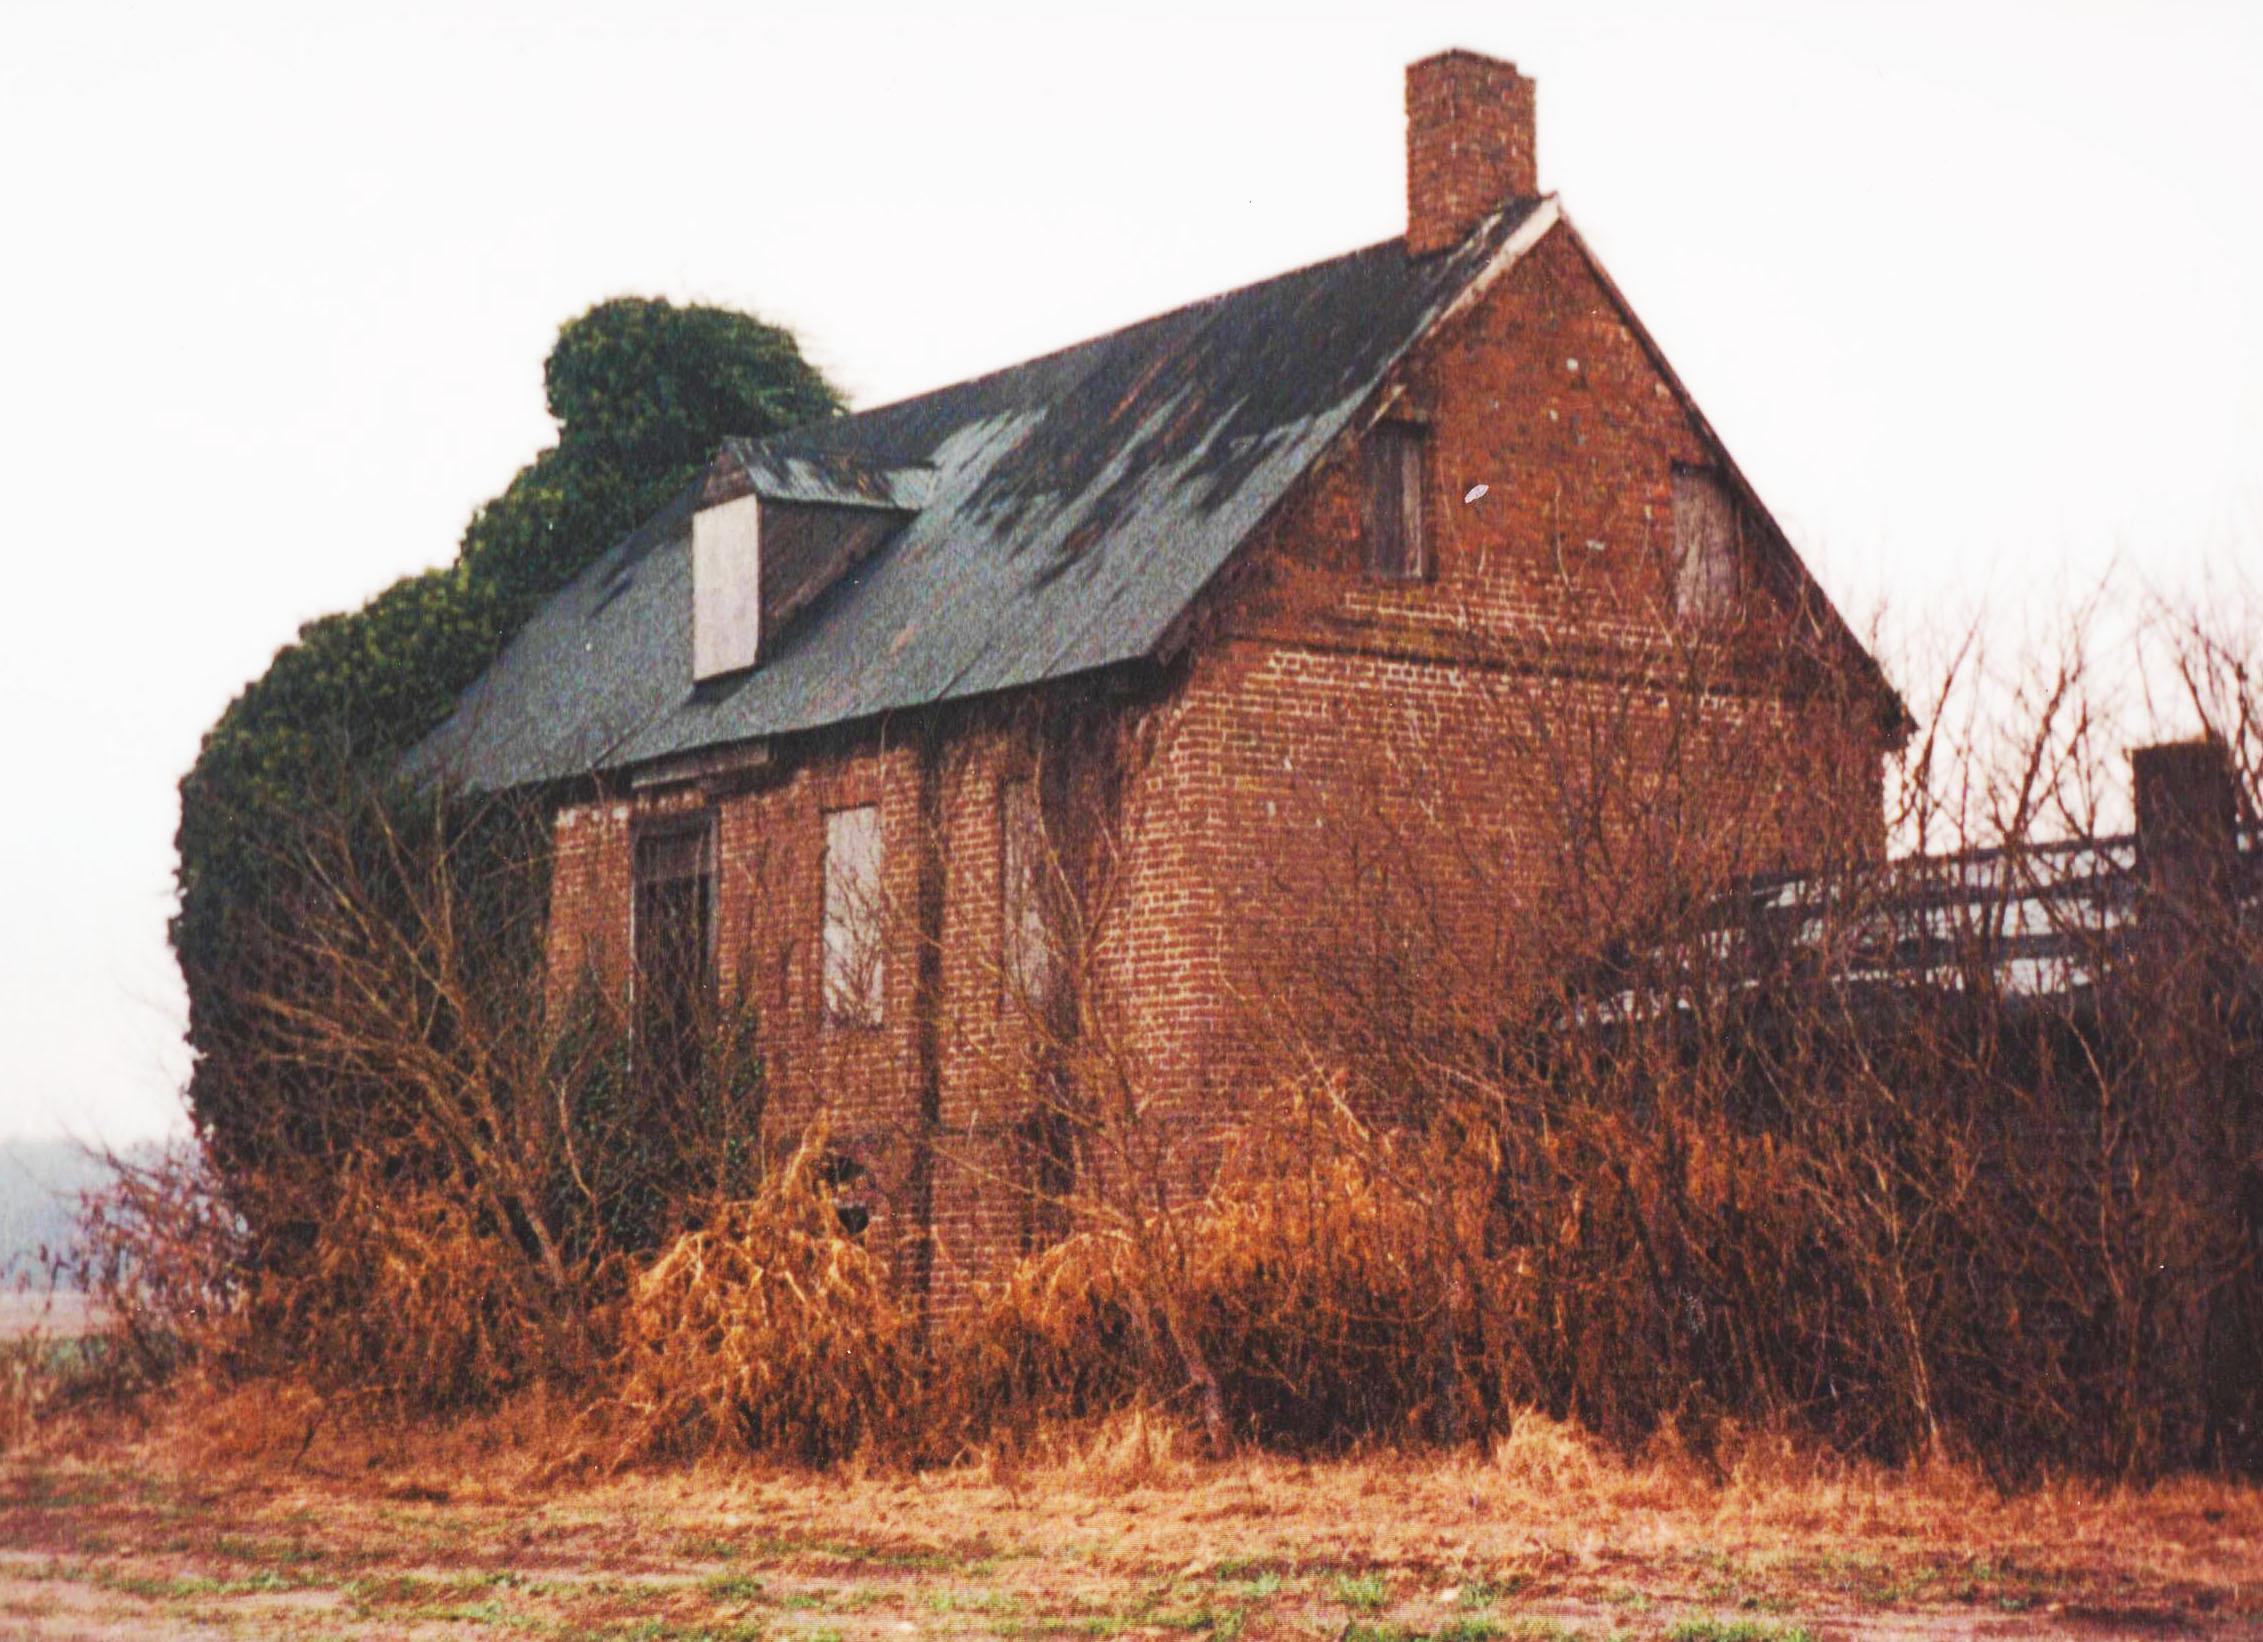 Handsell House Prior to Restoration ca. 2003 | Image Credit: Restore Handsell